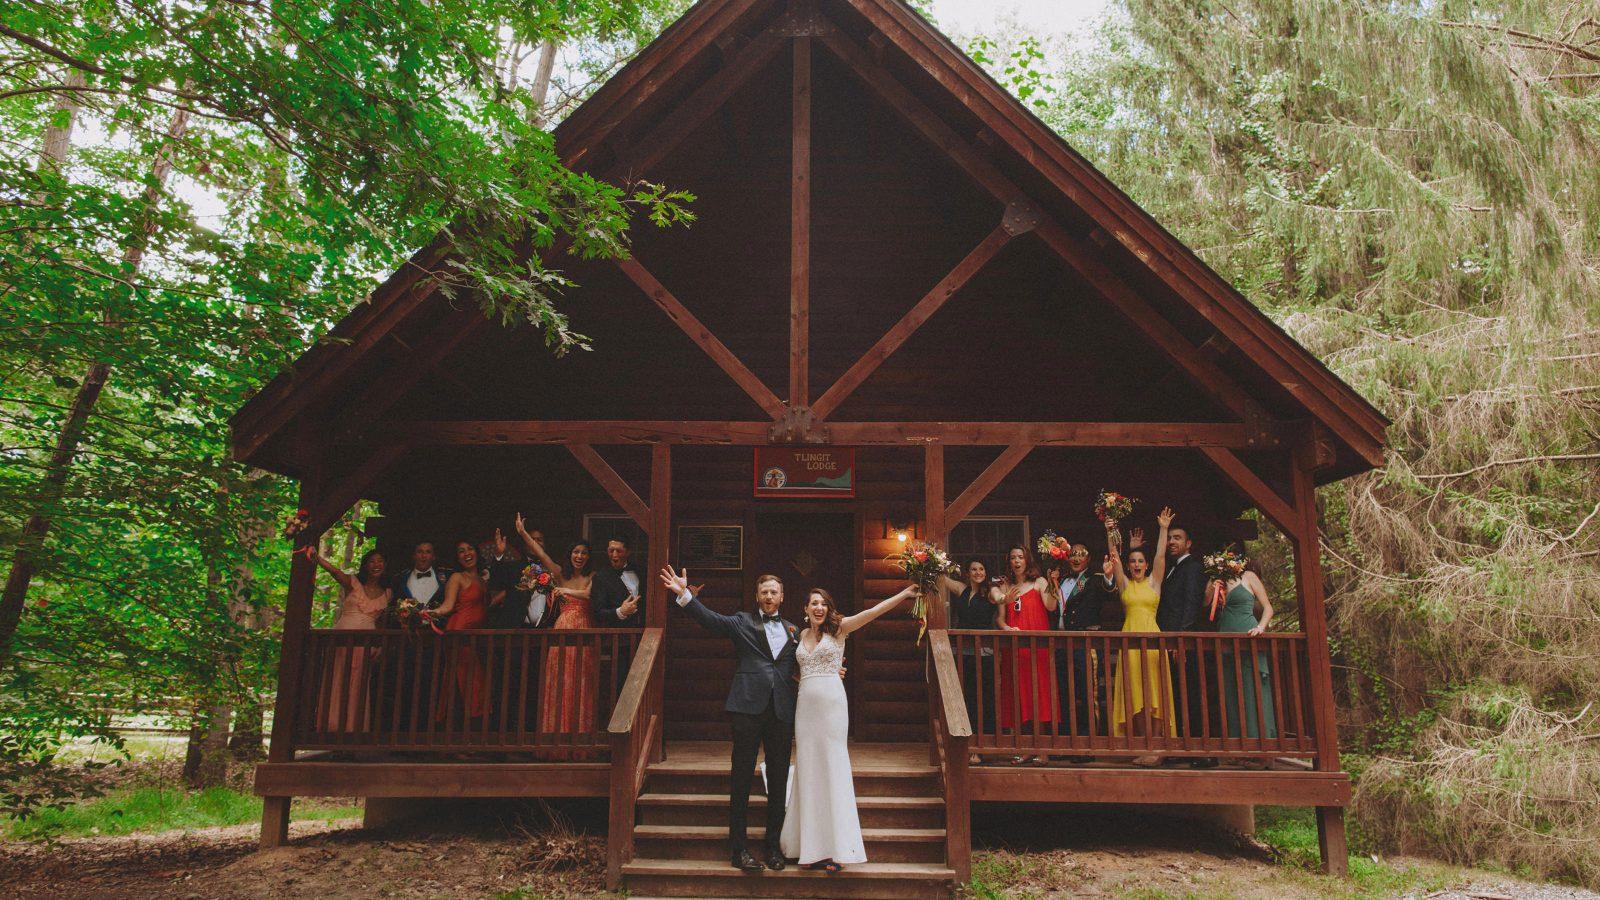 Leona & Garrett's Camp Wedding at Puh'Tok